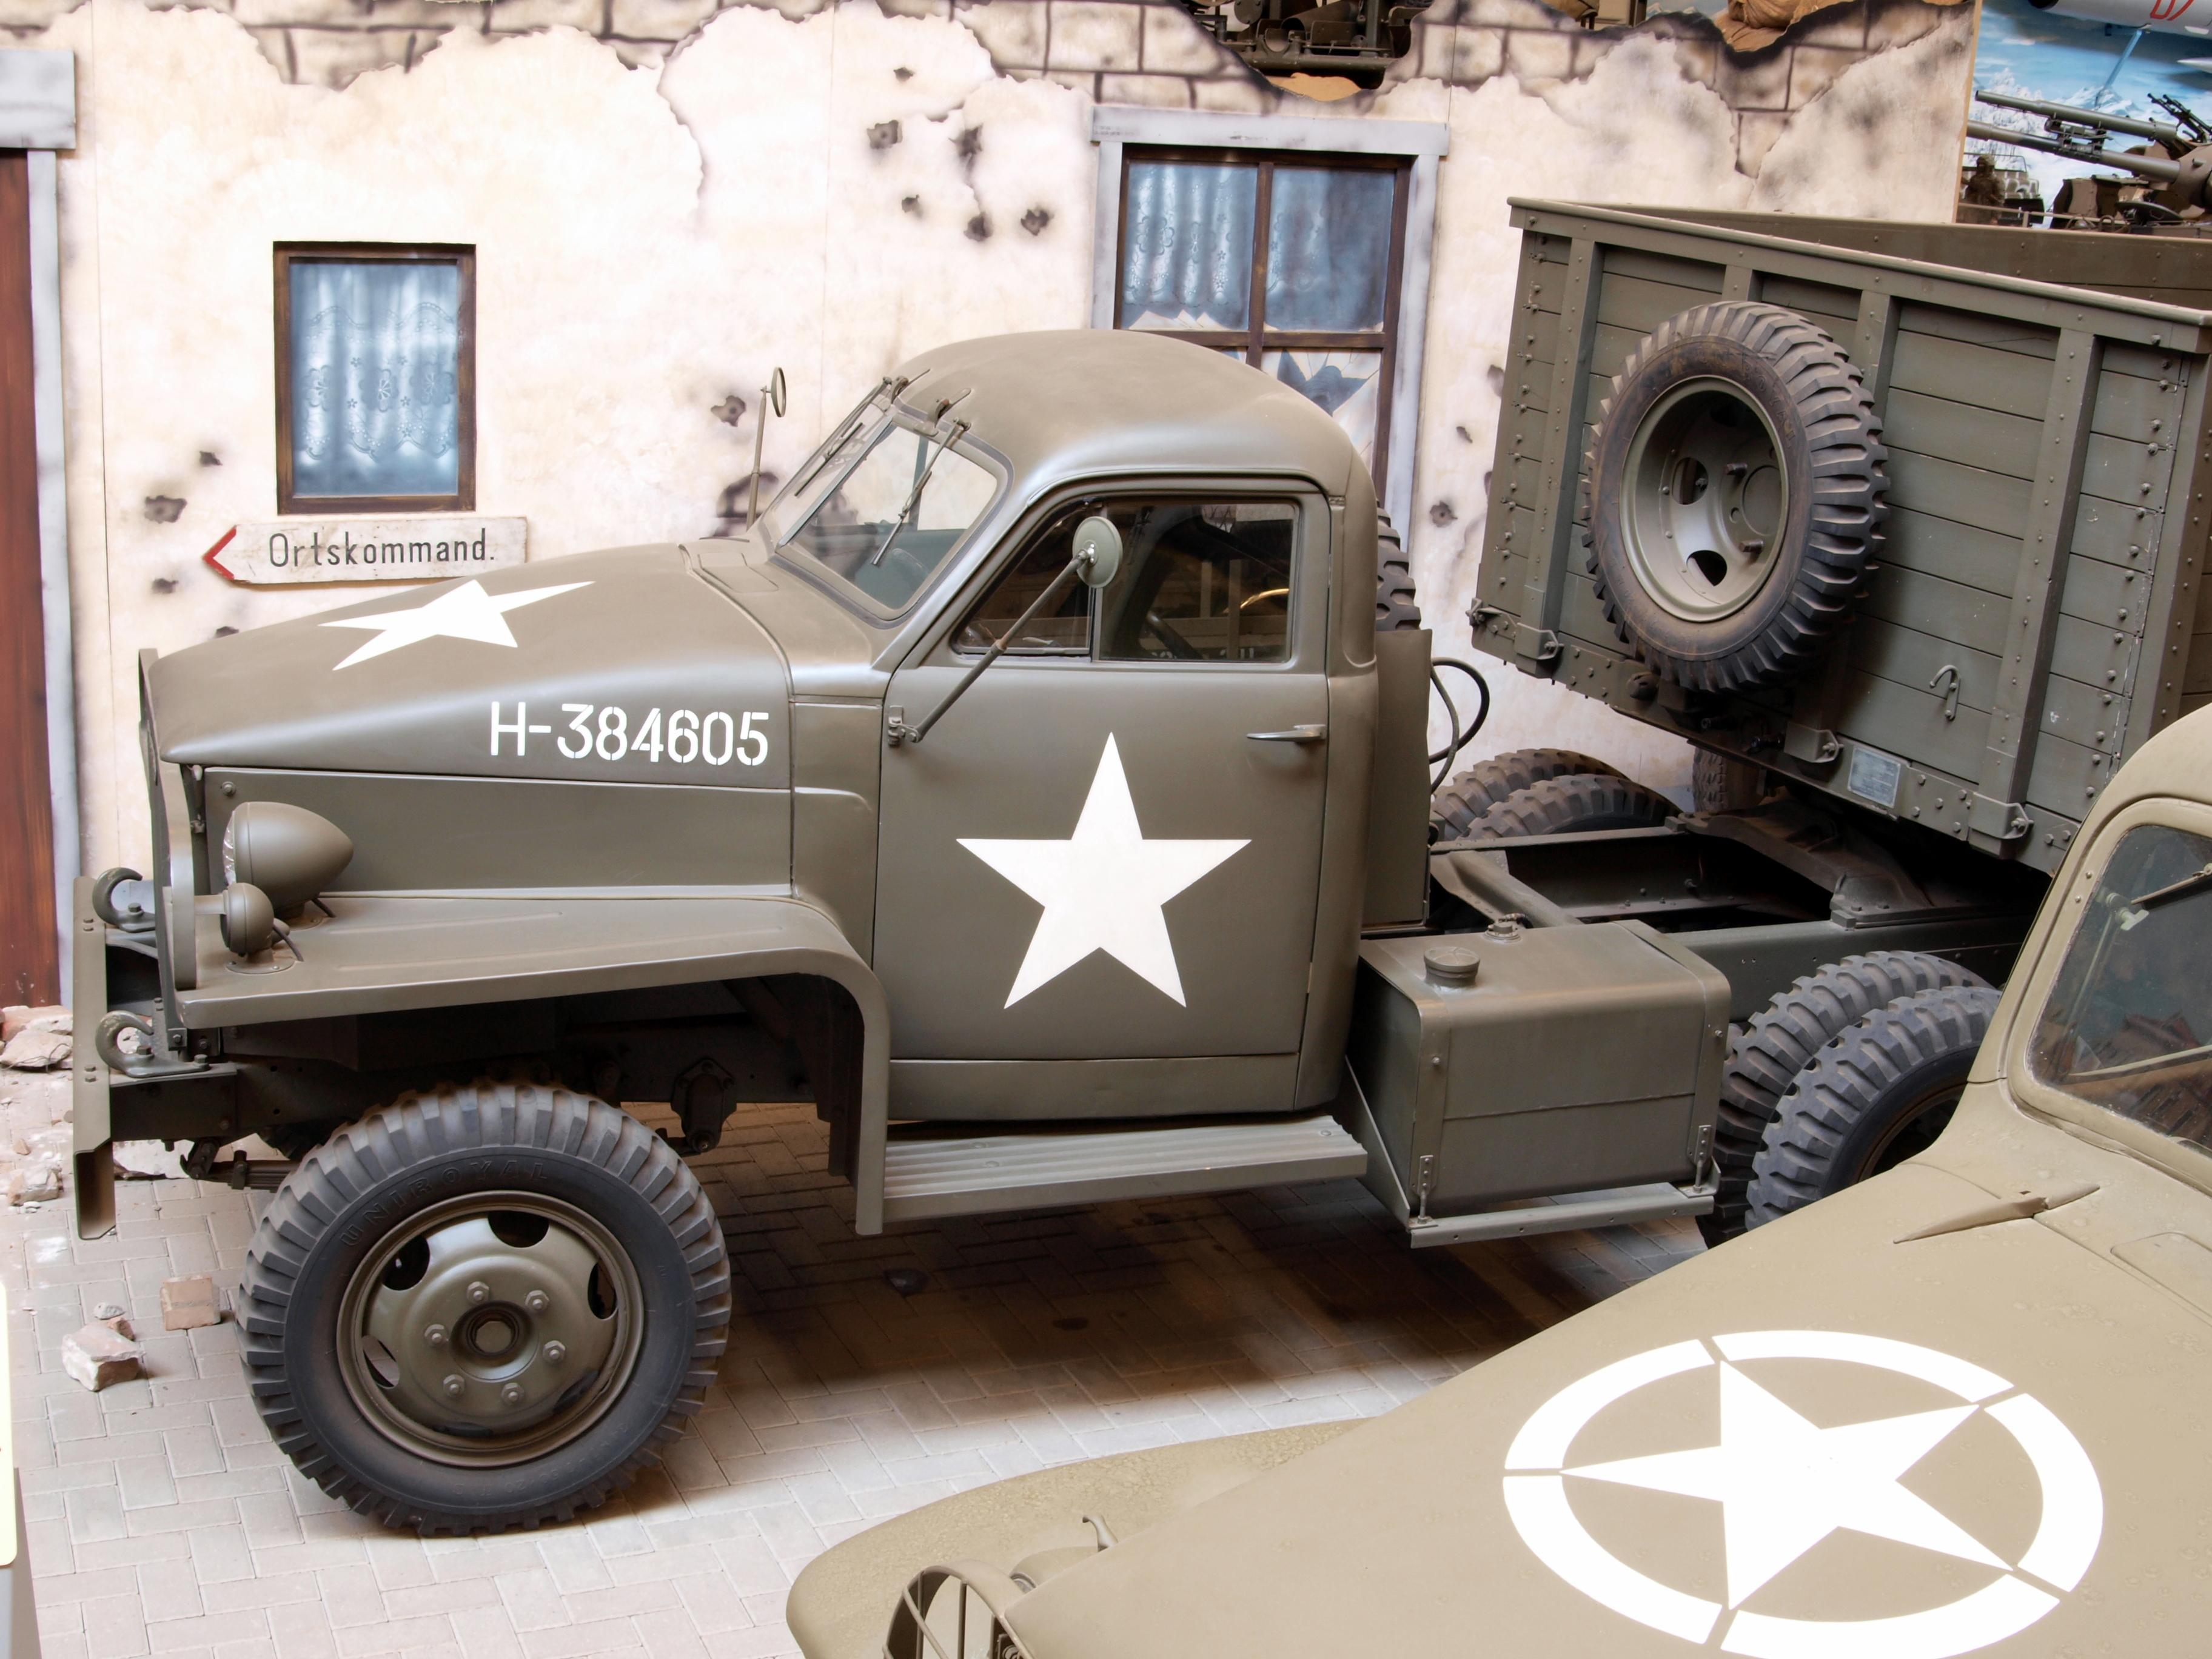 Rpm To G Conversion Chart: Studebaker US6 2½-ton 6x6 truck - Wikipedia,Chart